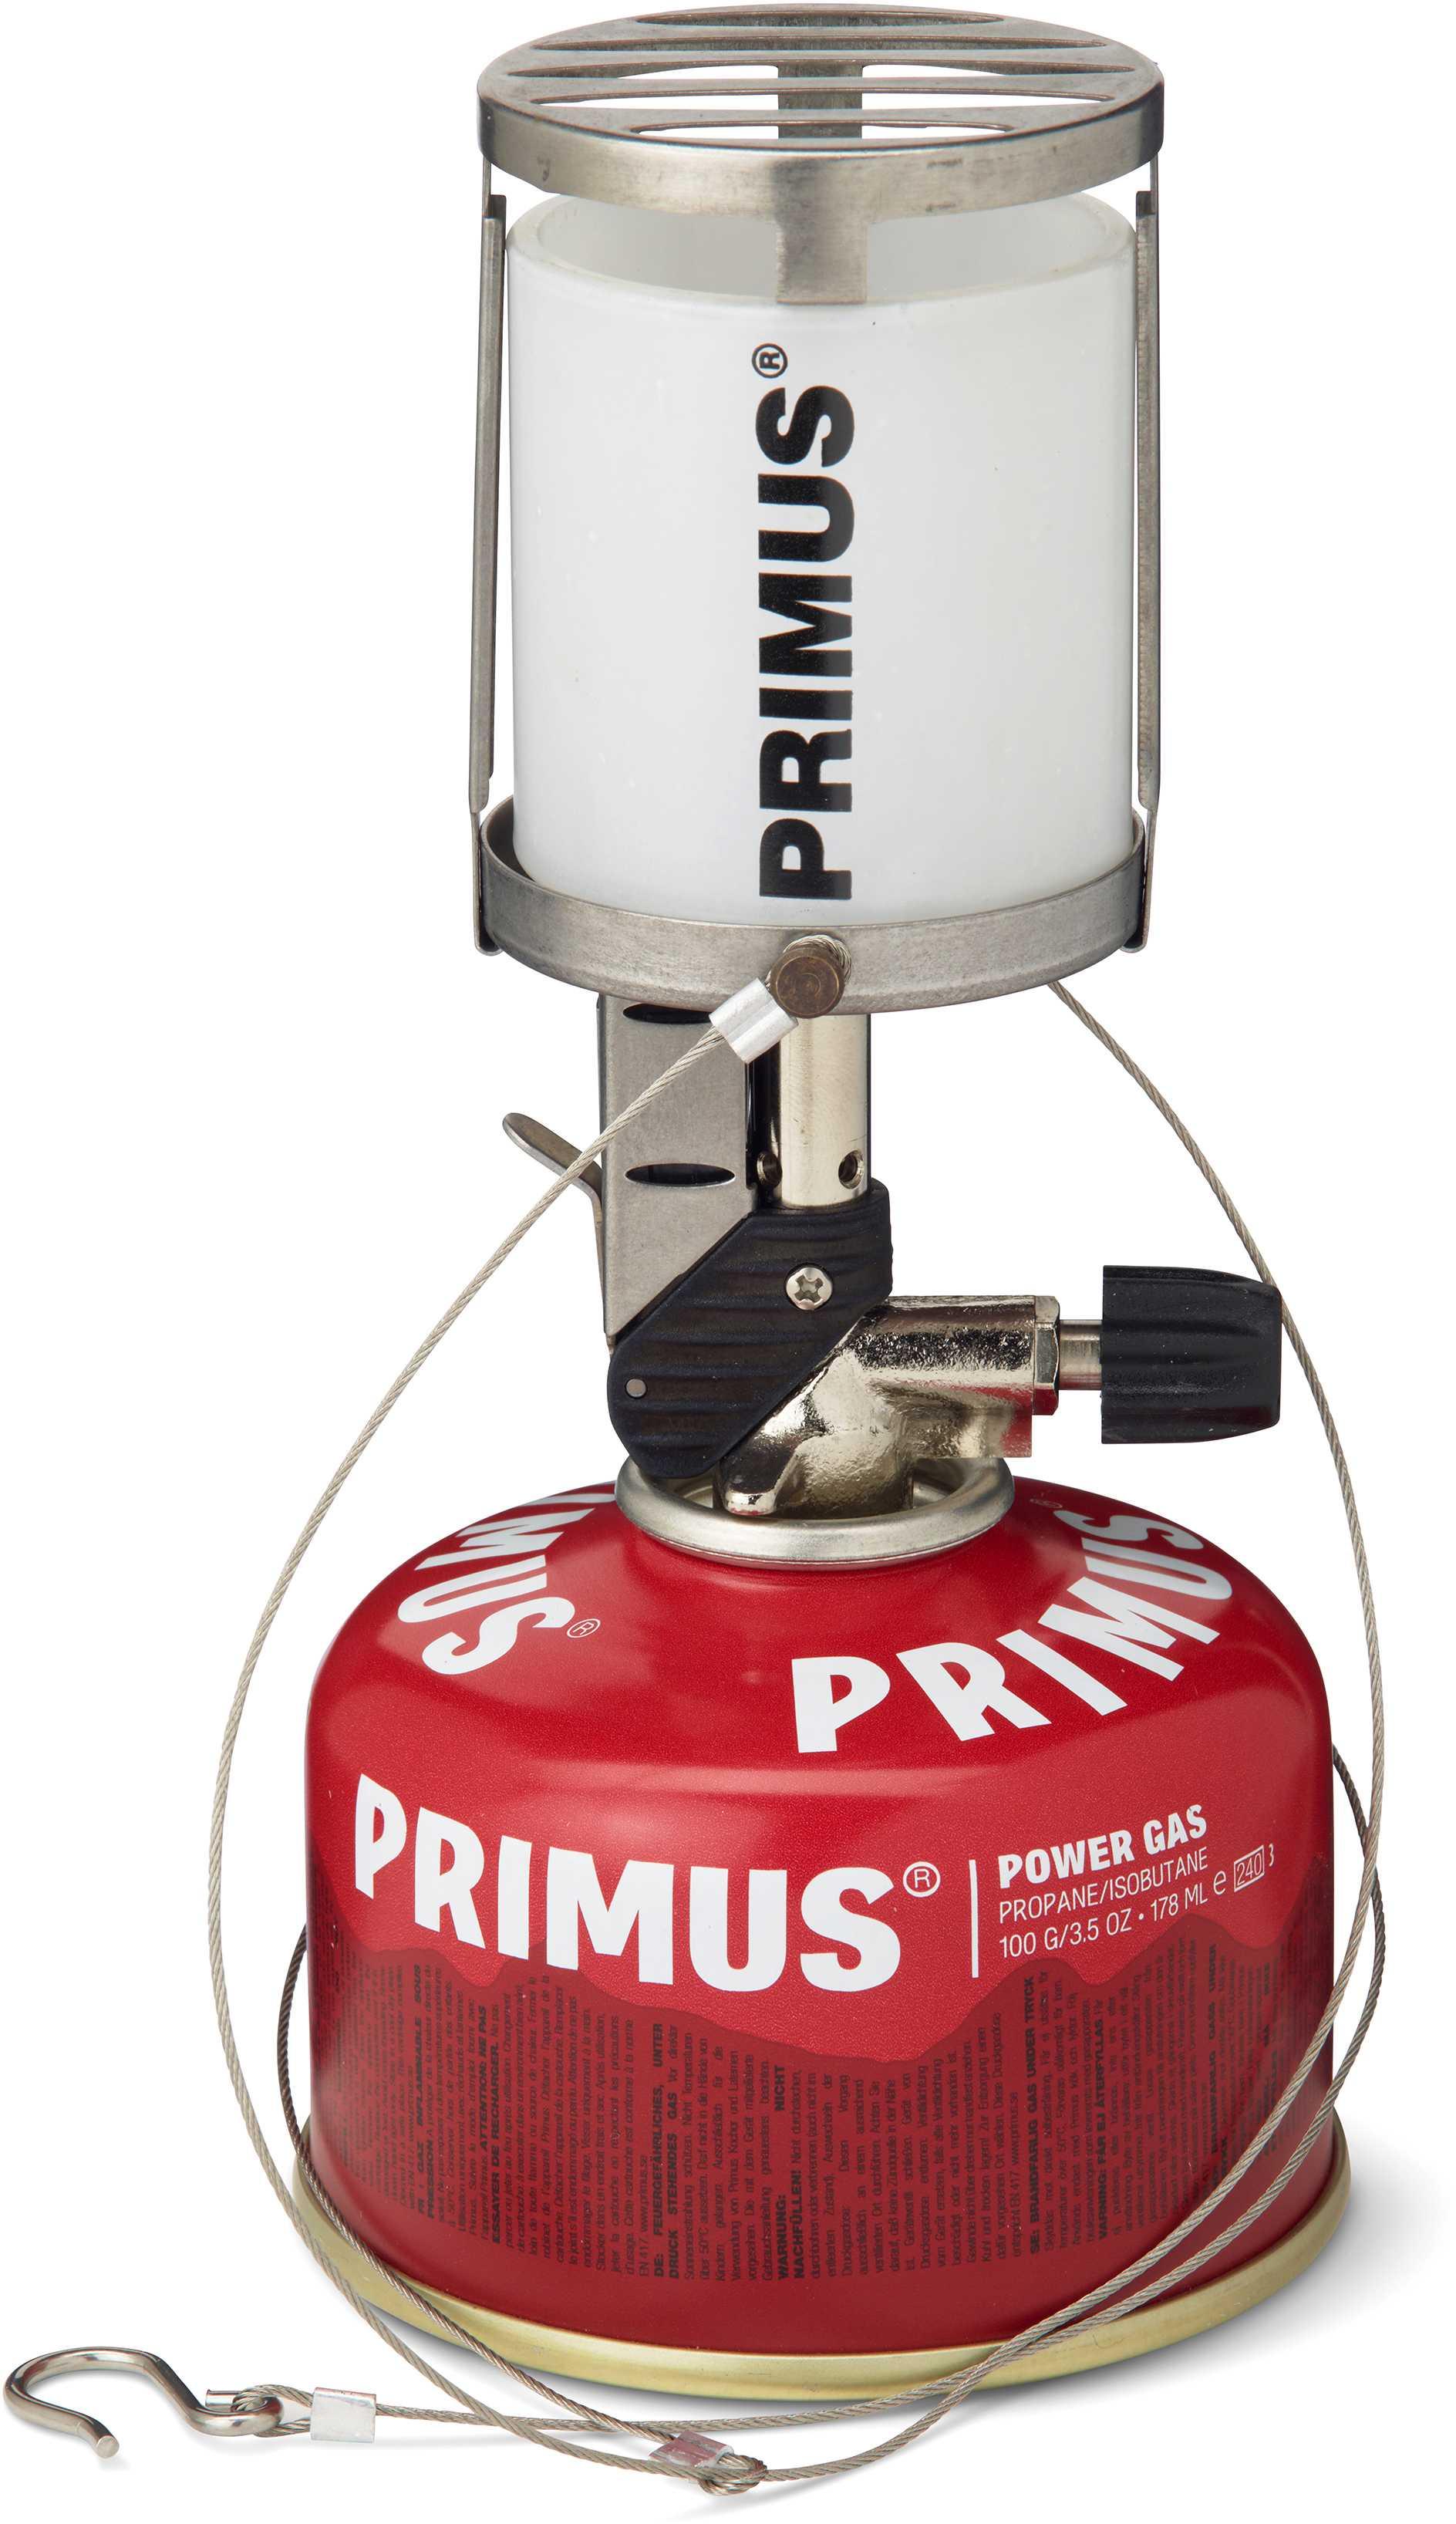 Primus Lyktglas Till Micron Lantern (2213) | Flashlight